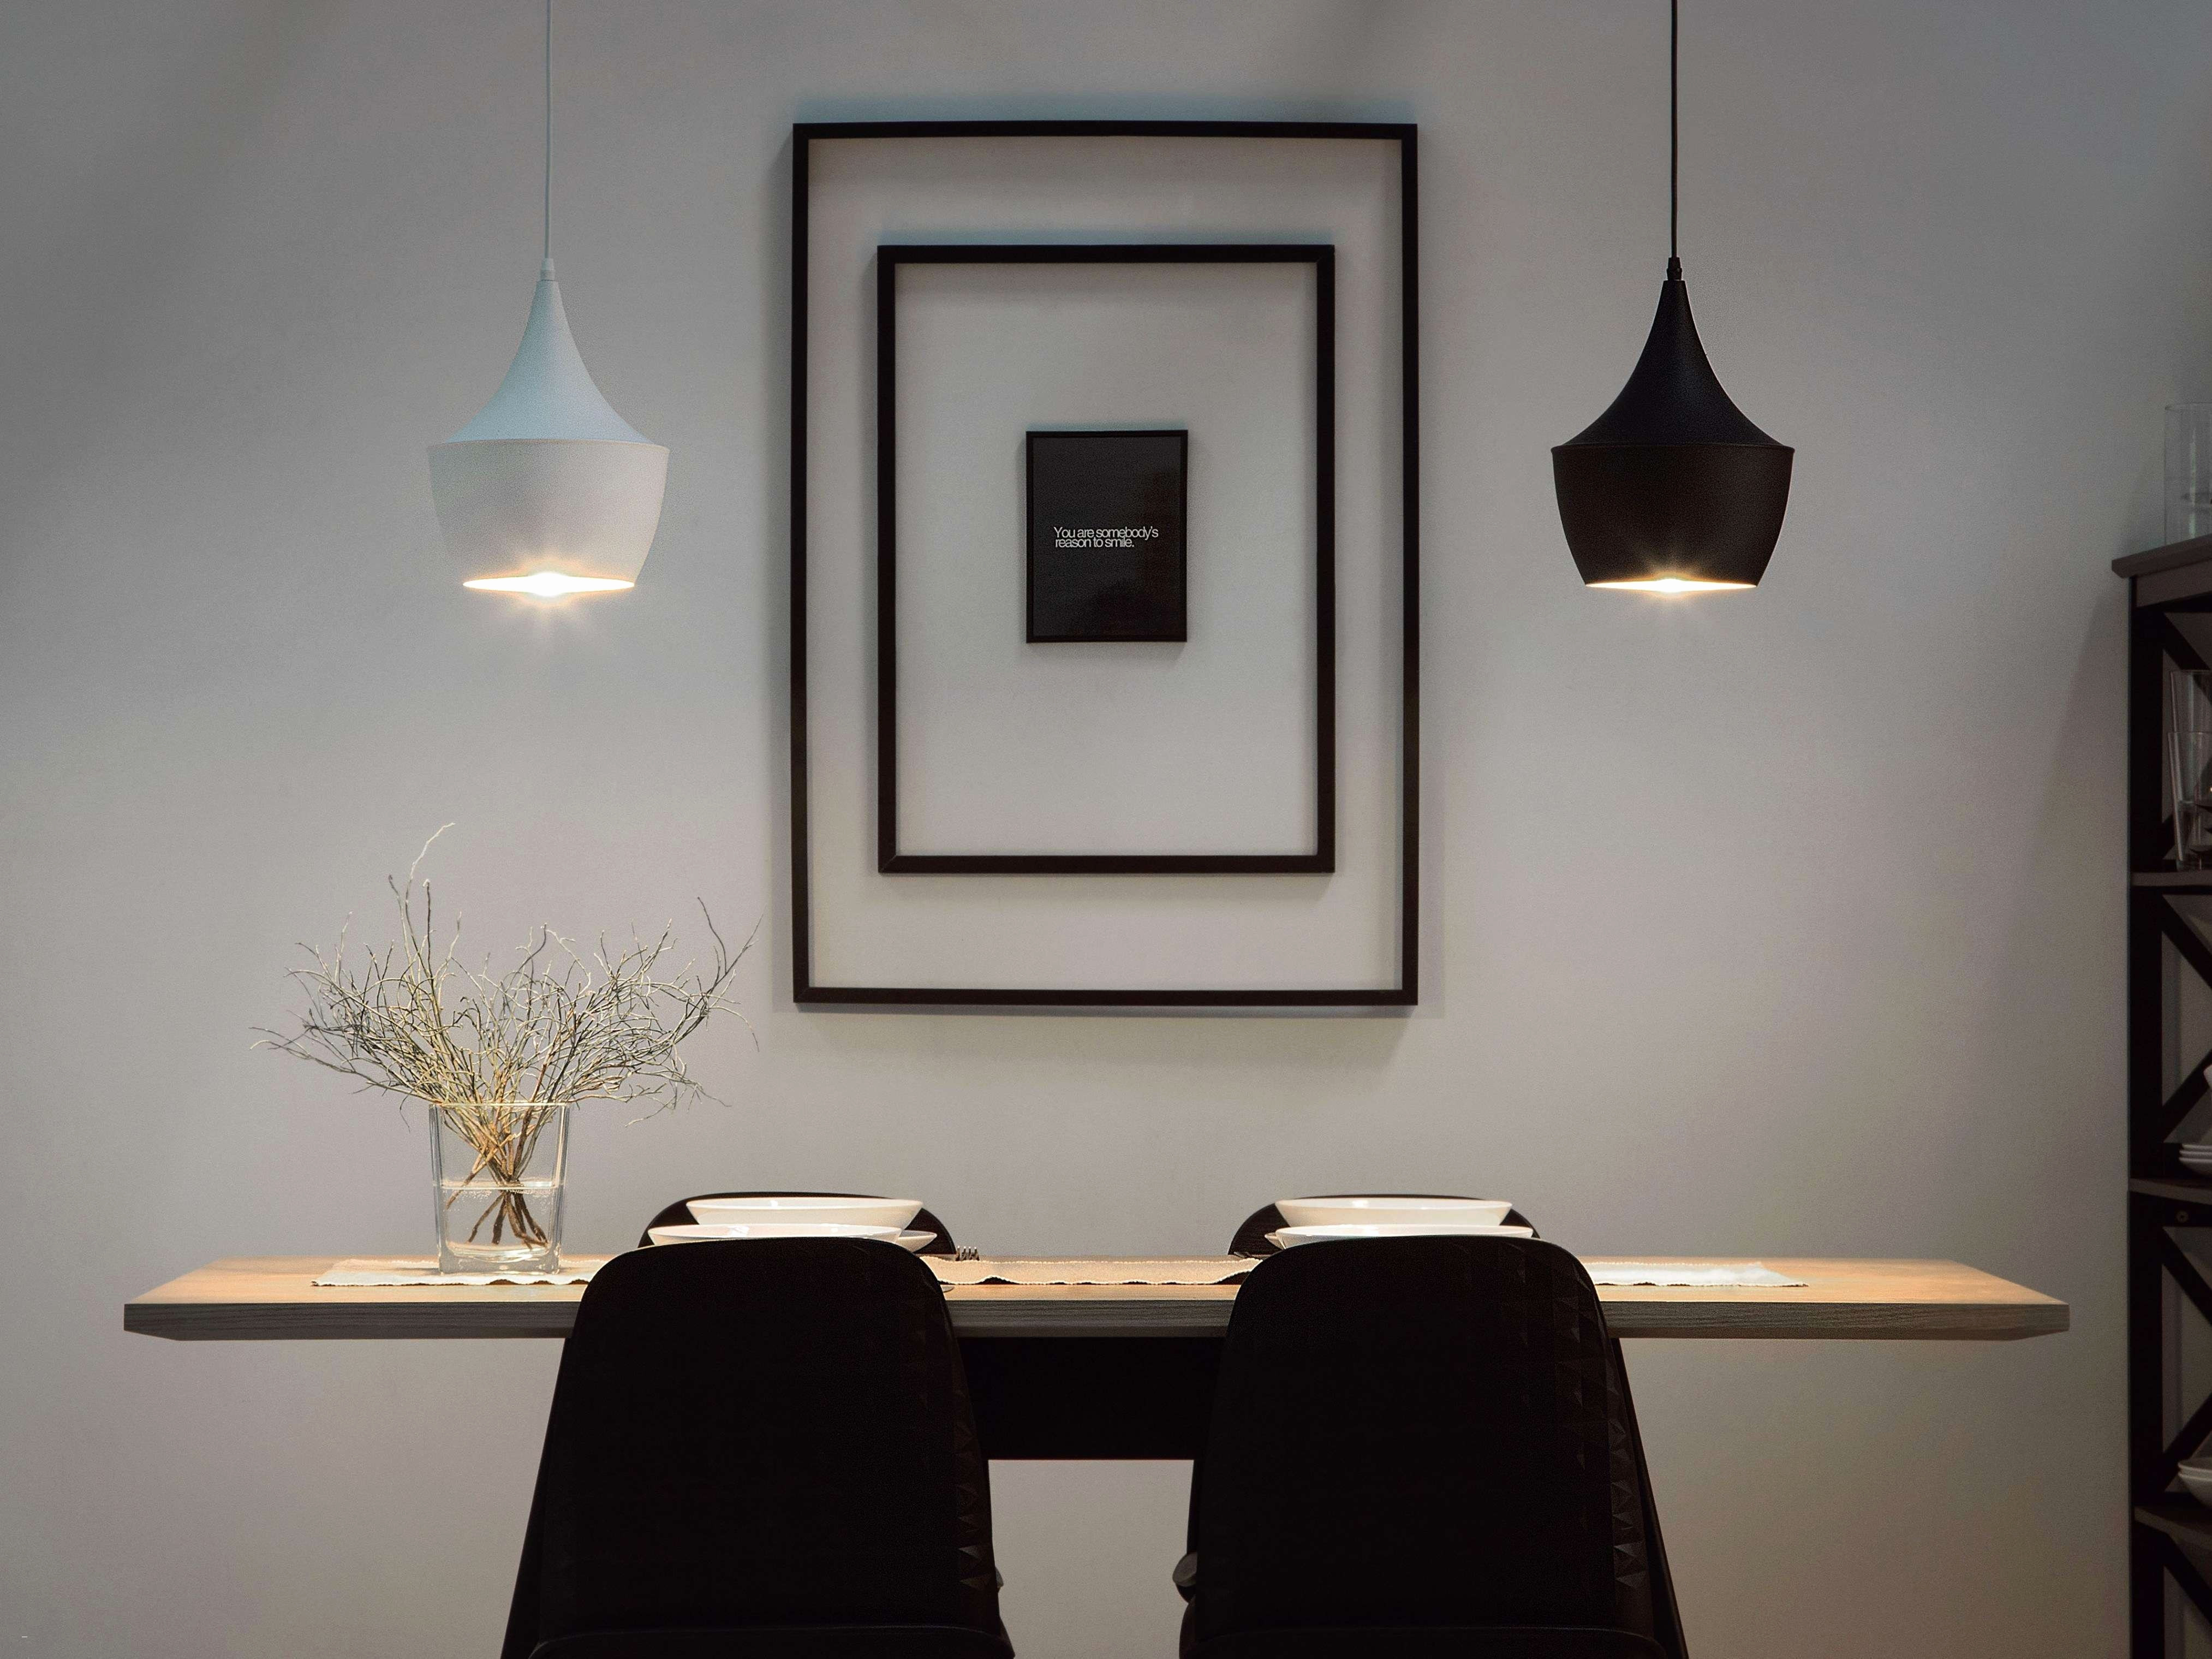 ikea rectangular glass vase of 30 best of ikea table lights creative lighting ideas for home throughout ikea wall lighting fixtures moderne schlafzimmer lampe elegant scha¶n deckenlampe 0d a· outdoor wall light